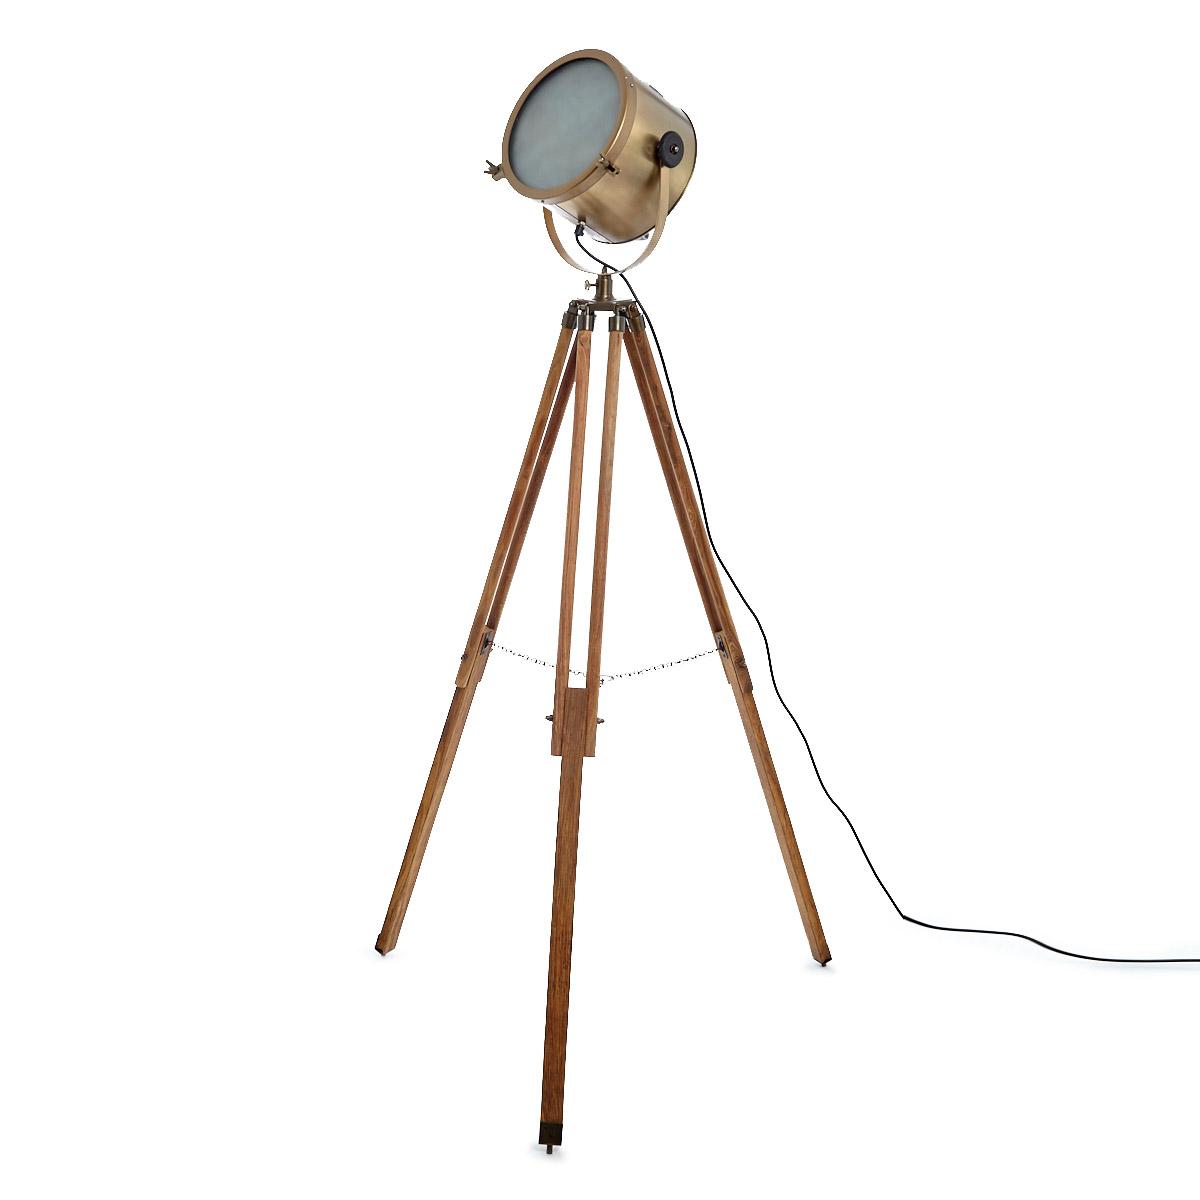 Spotlight old fashioned. Paul costelloe living lamp